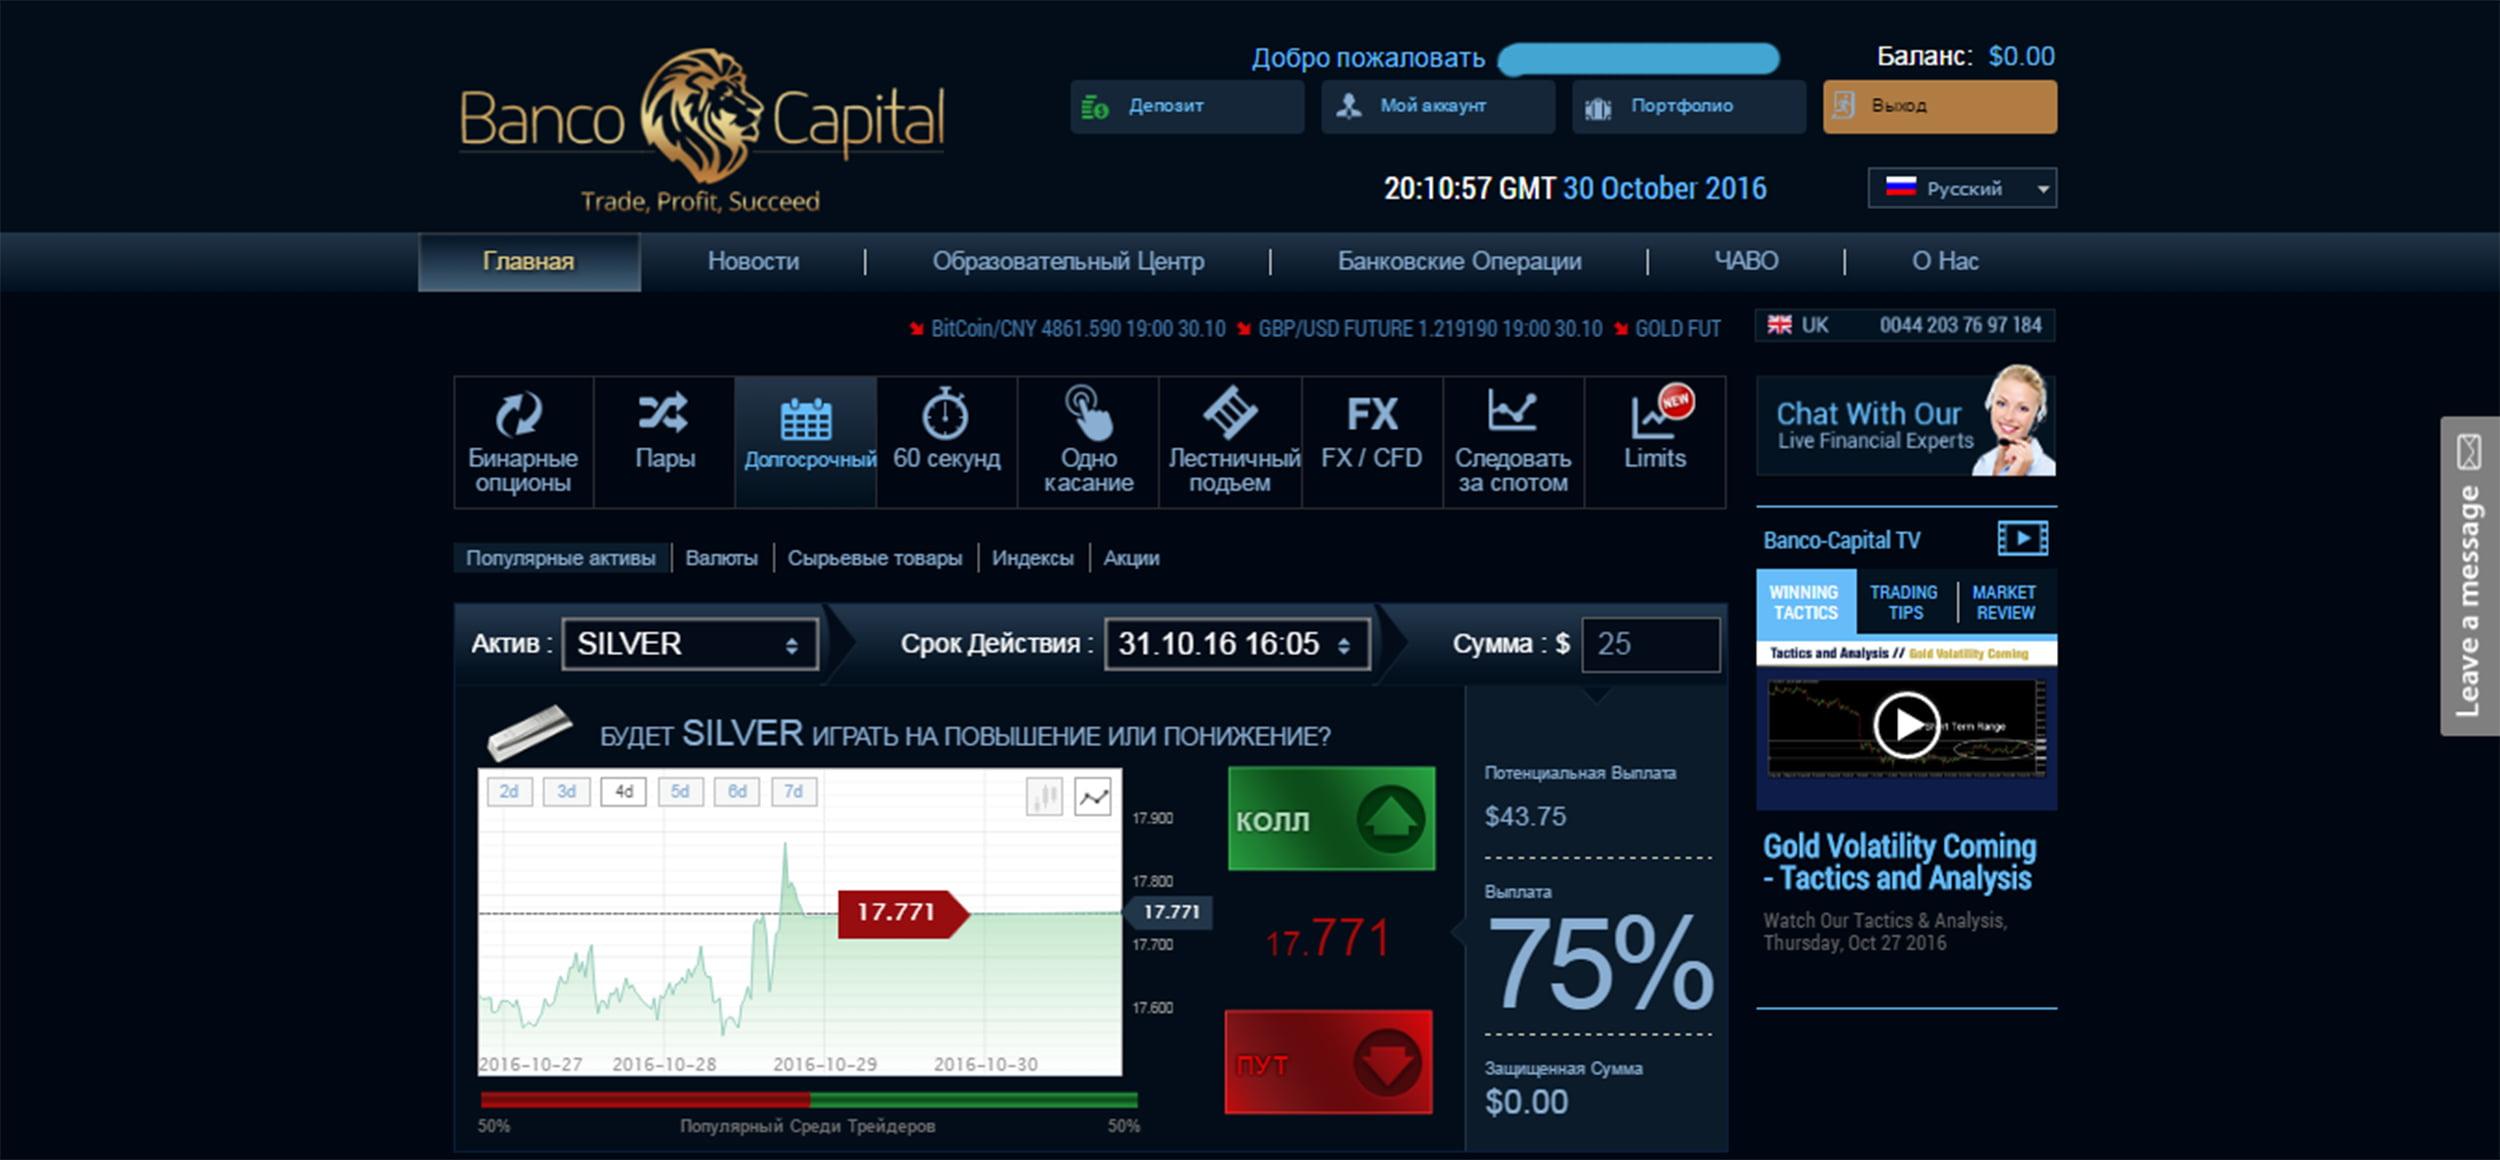 Banco capital бинарные опционы xalif форекс индикатор